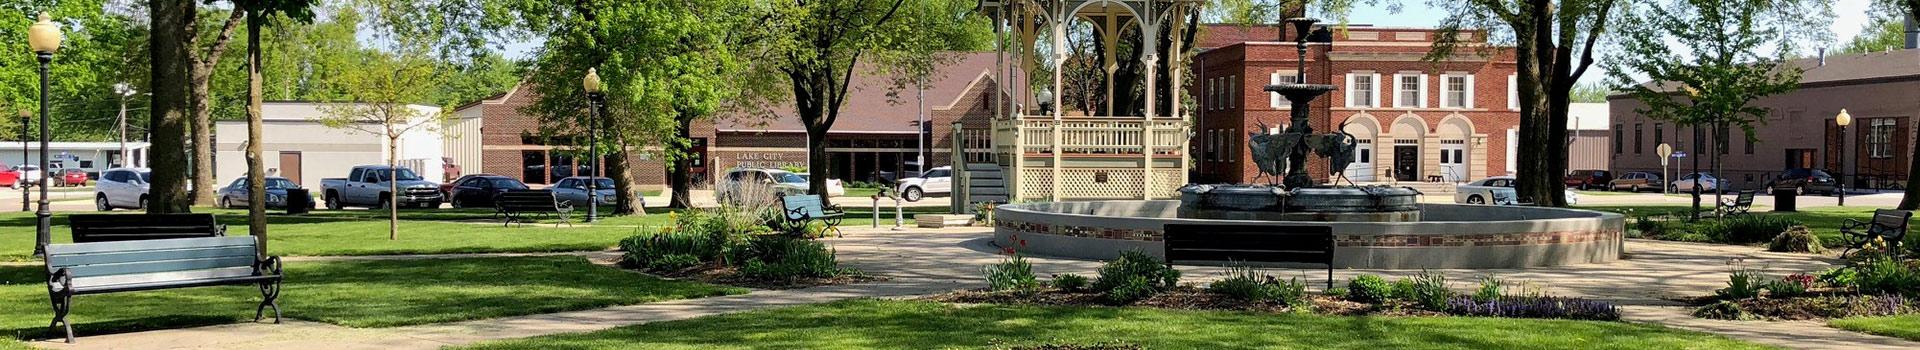 Lake City Iowa